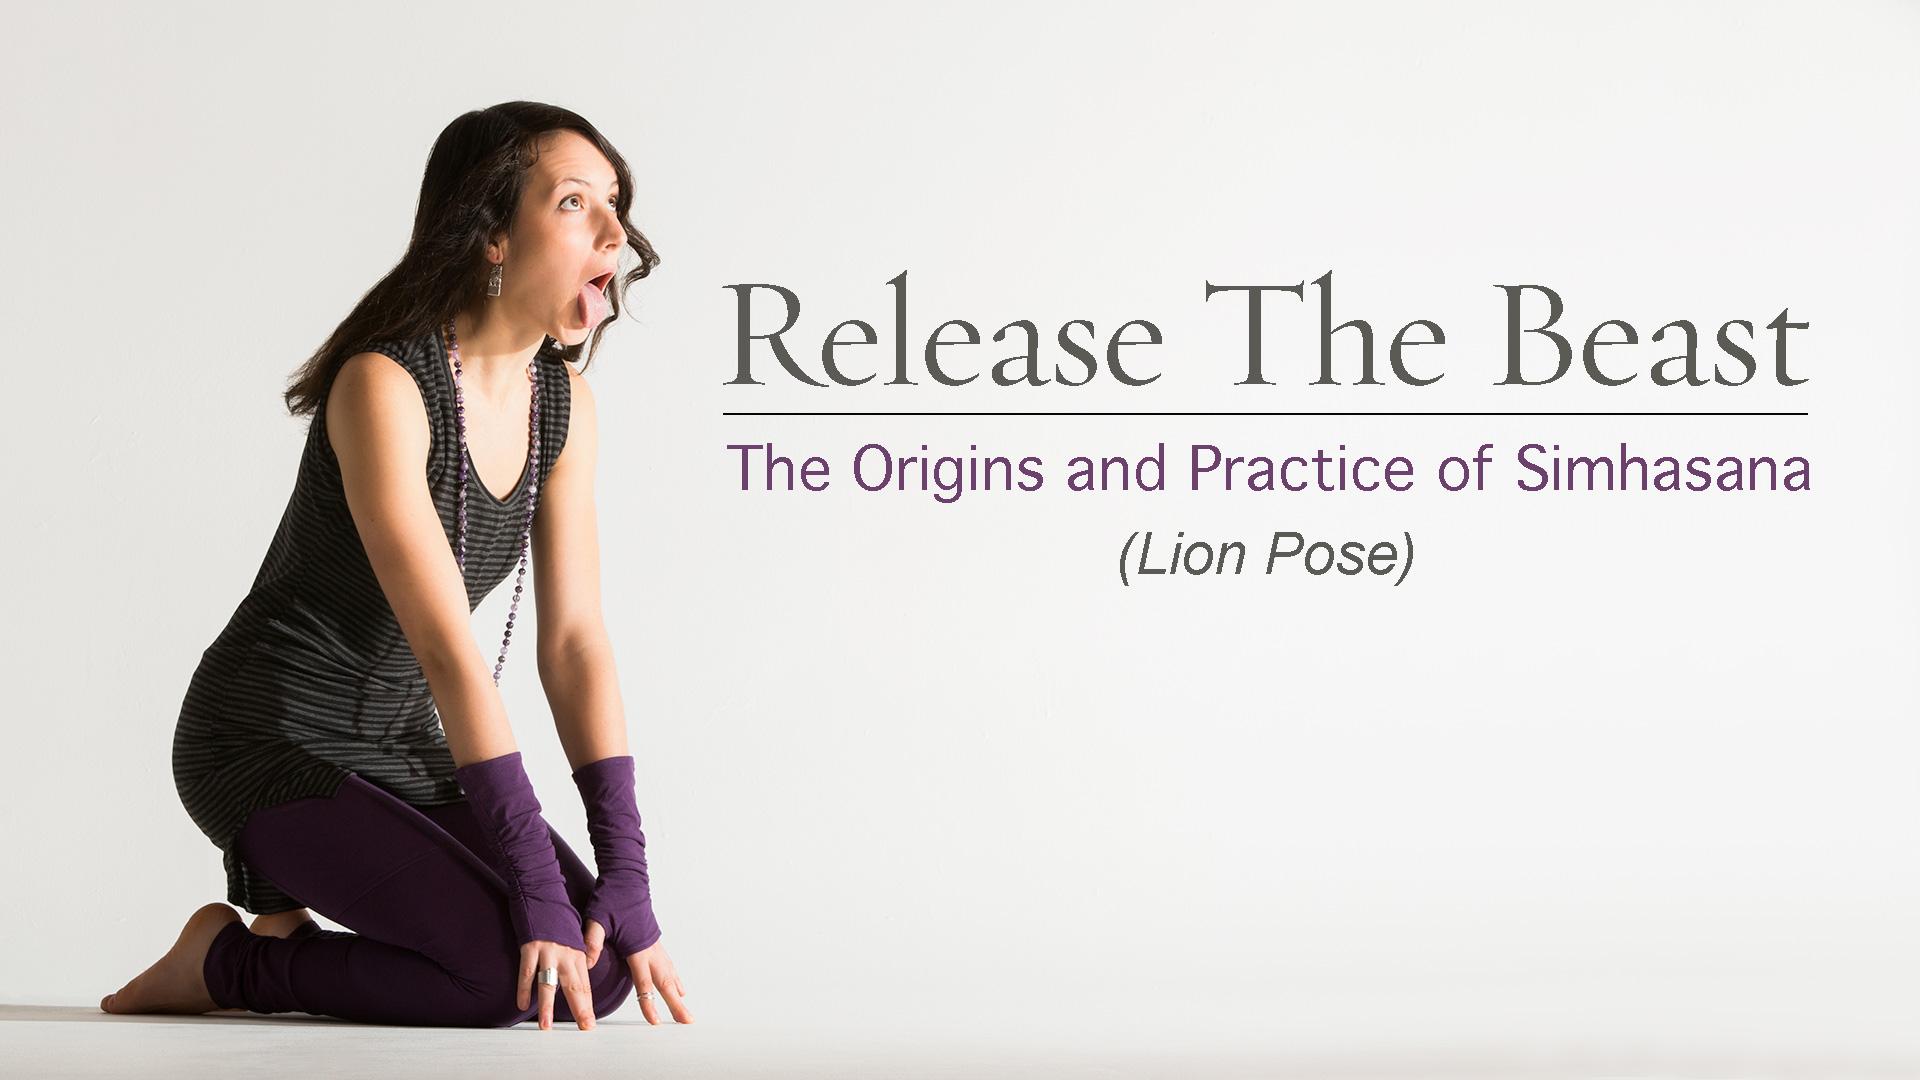 Release The Beast Origins And Practice Of Simhasana